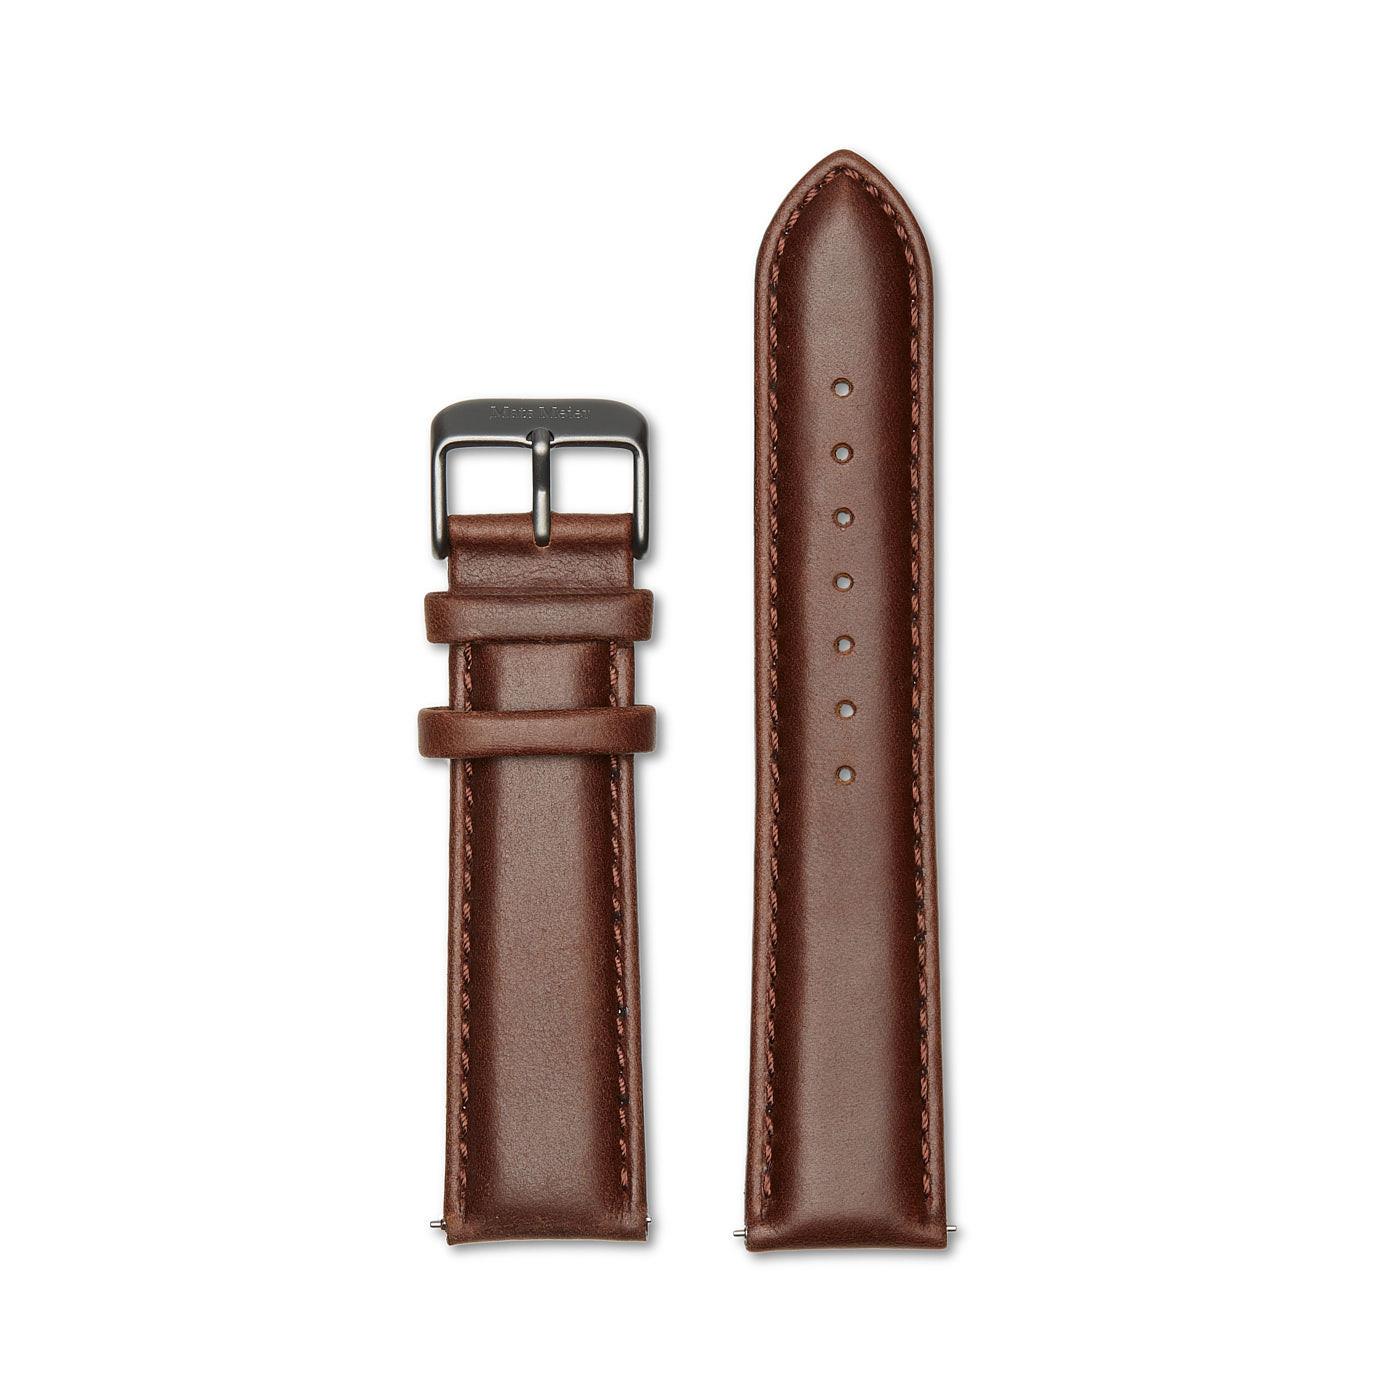 Mats Meier Grand Cornier bracelet montre cuir 22 mm marron